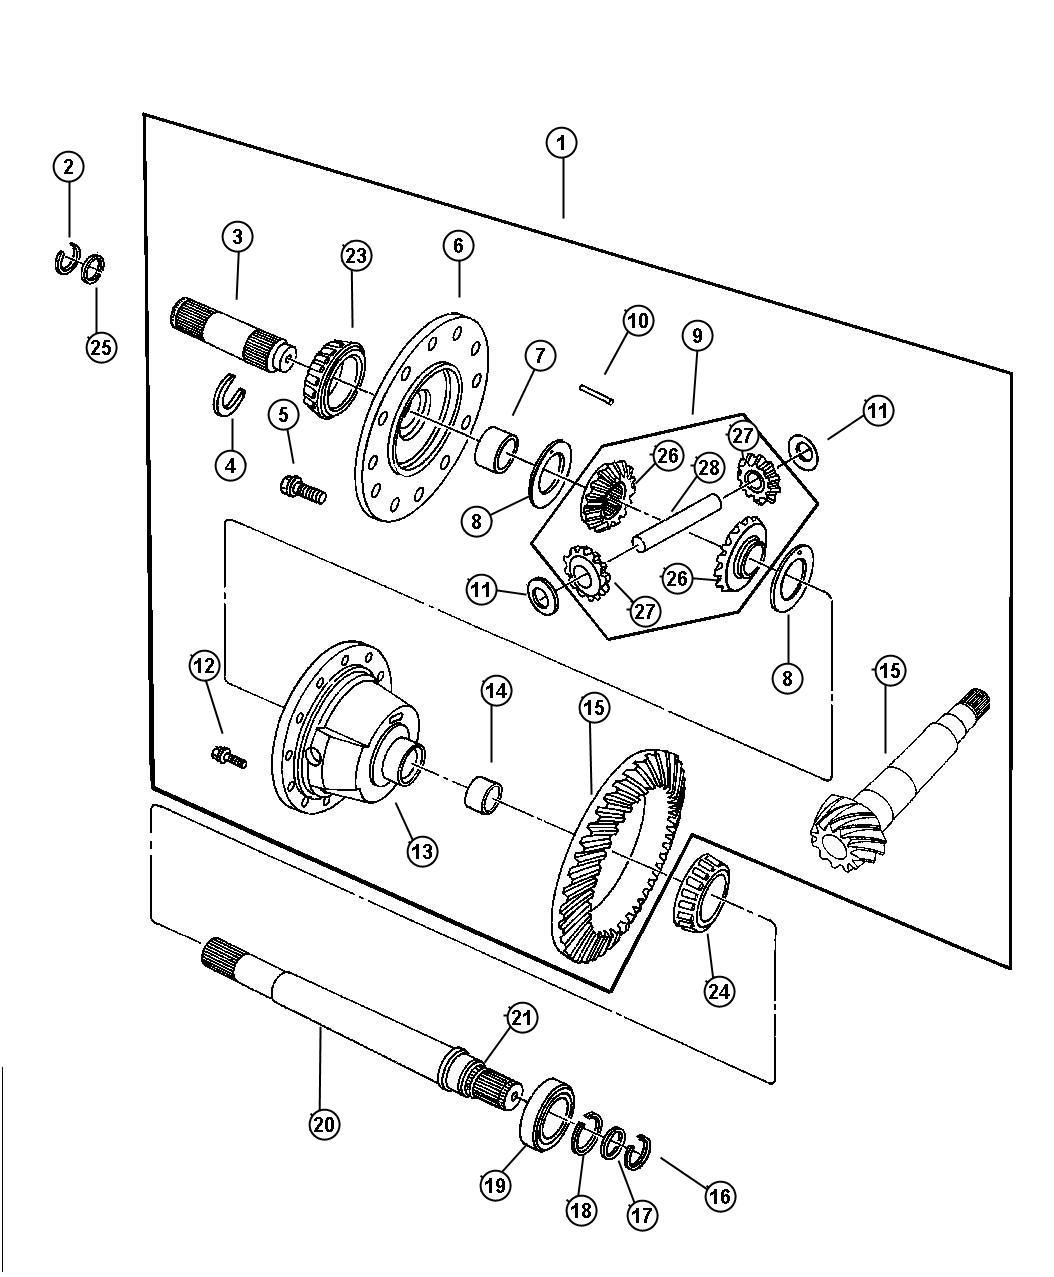 1999 Chrysler Concorde Transmission Diagram Full Hd Version Transmission Diagram Tolldiagram Emballages Sous Vide Fr